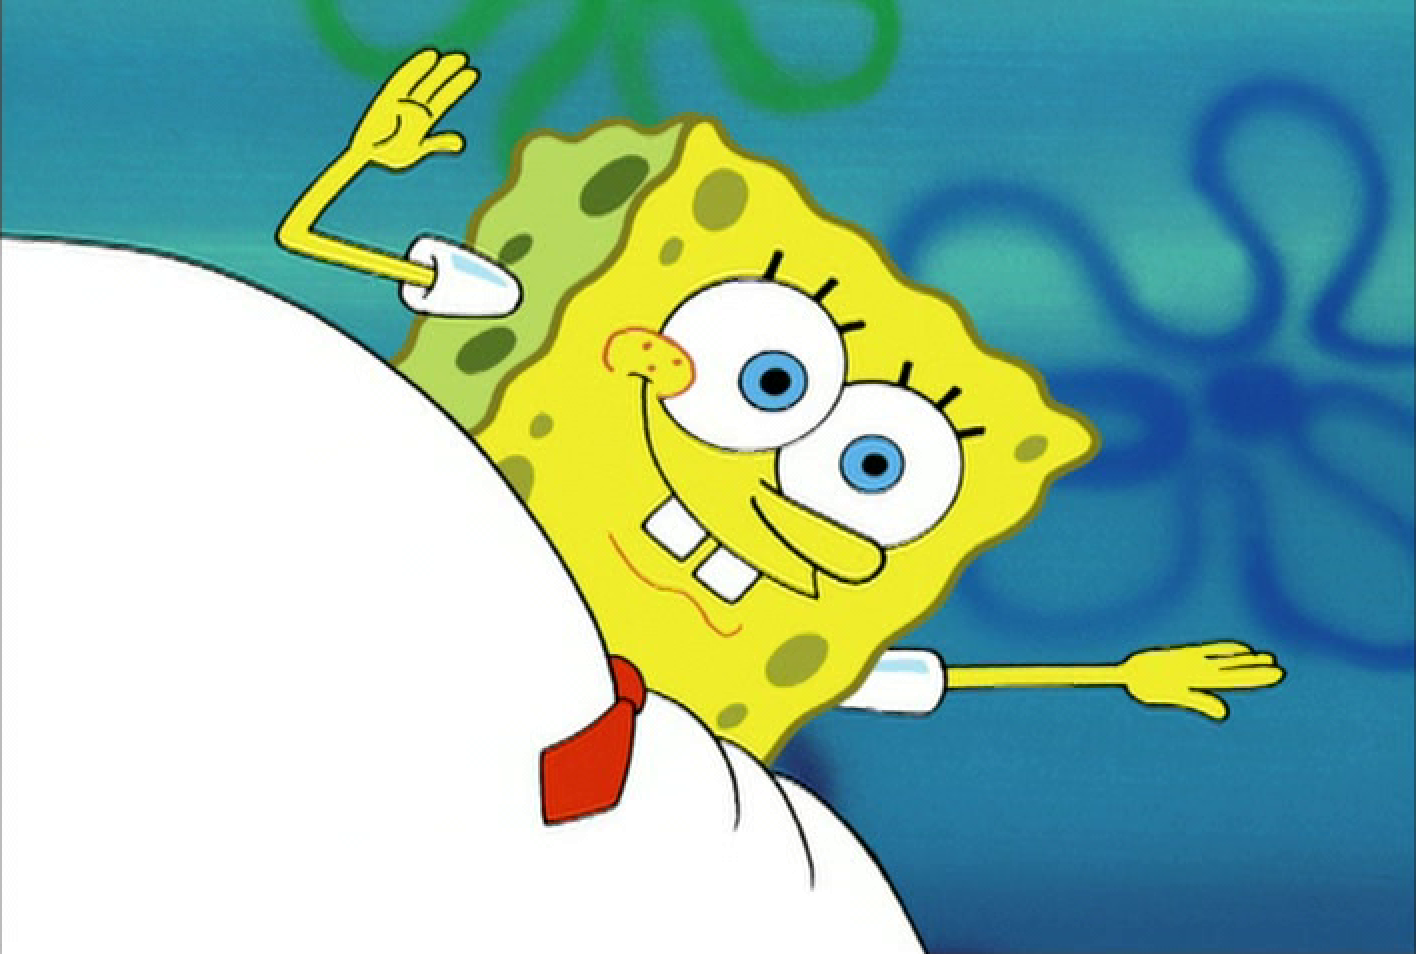 The Fun Adventure of Spongebob Squarepants